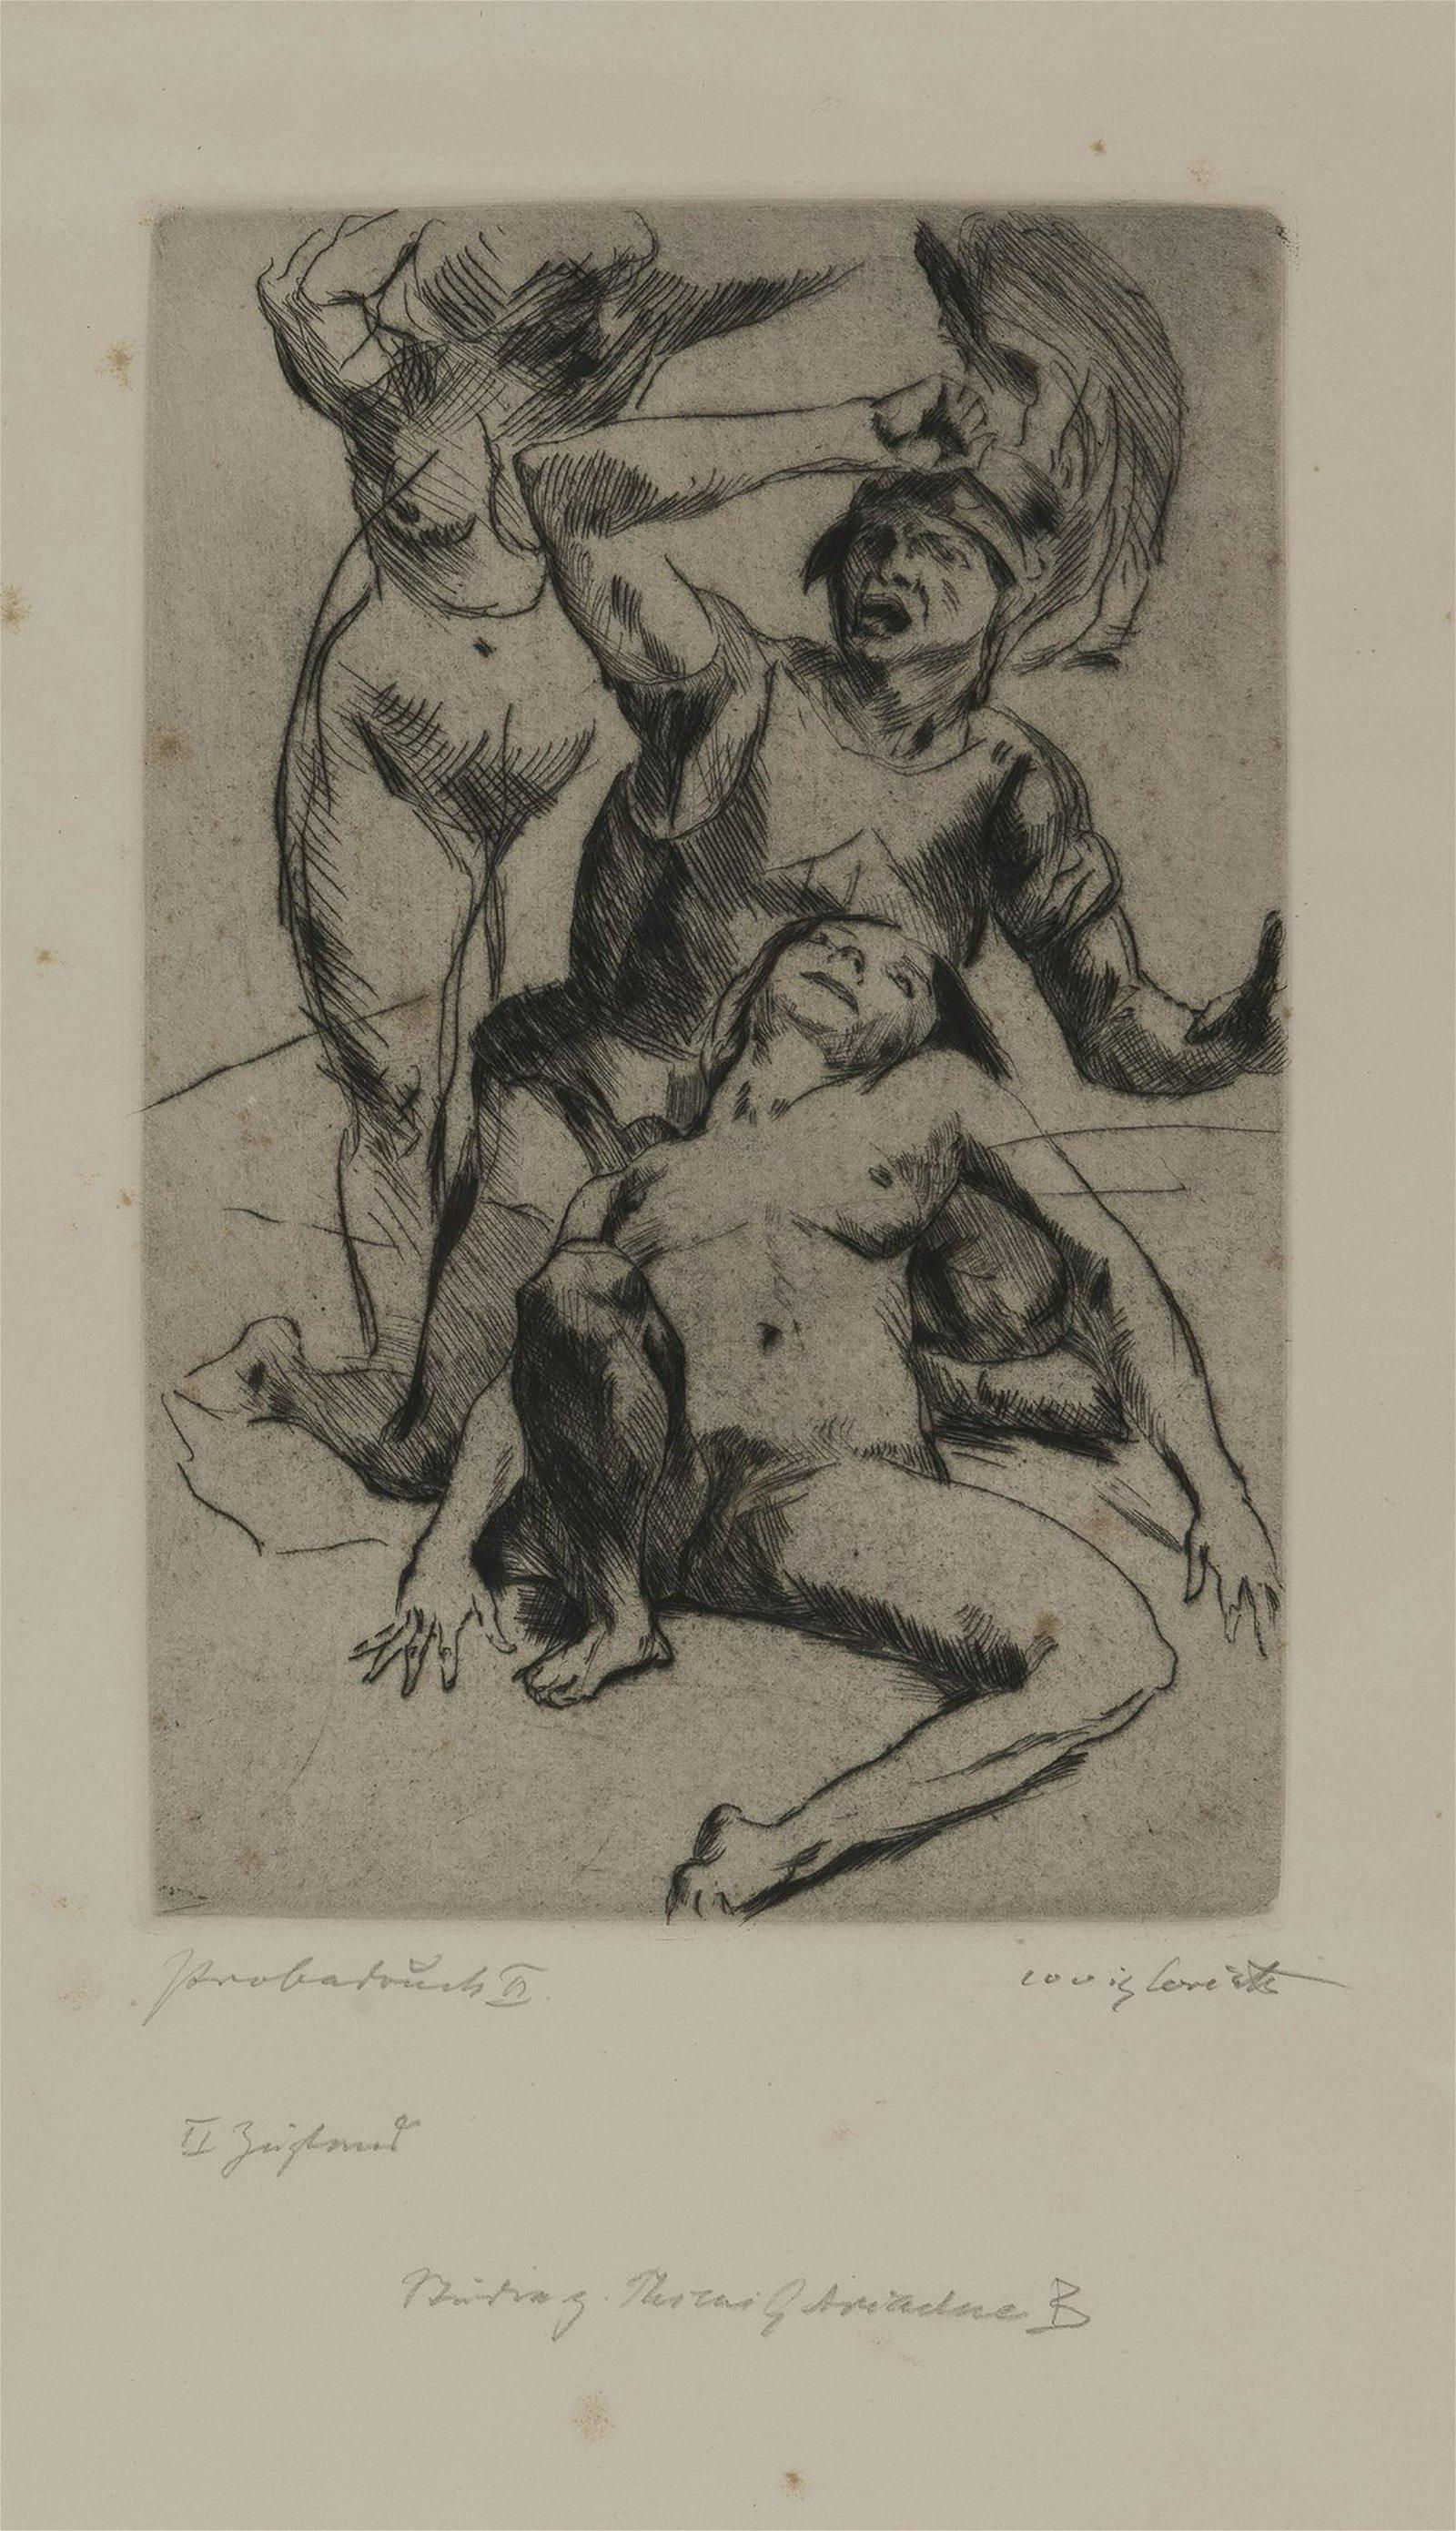 Lovis Corinth, 'Theseus and Ariadne I', 1914